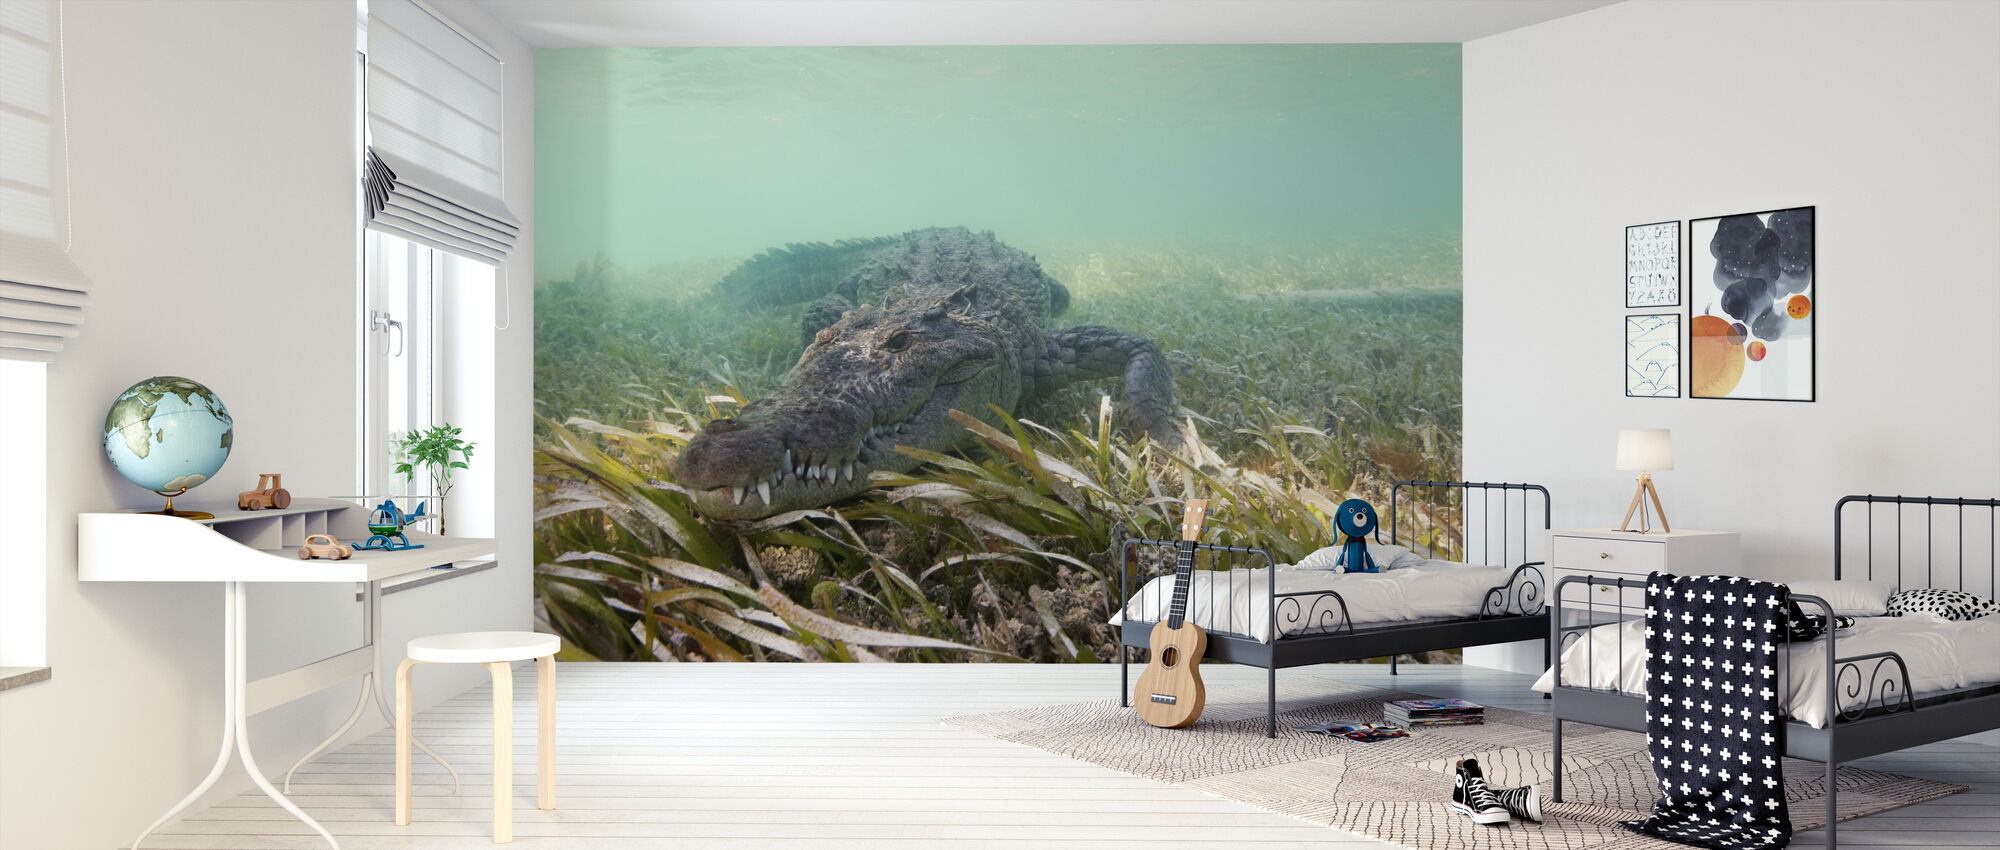 American Crocodile - Wallpaper - Kids Room